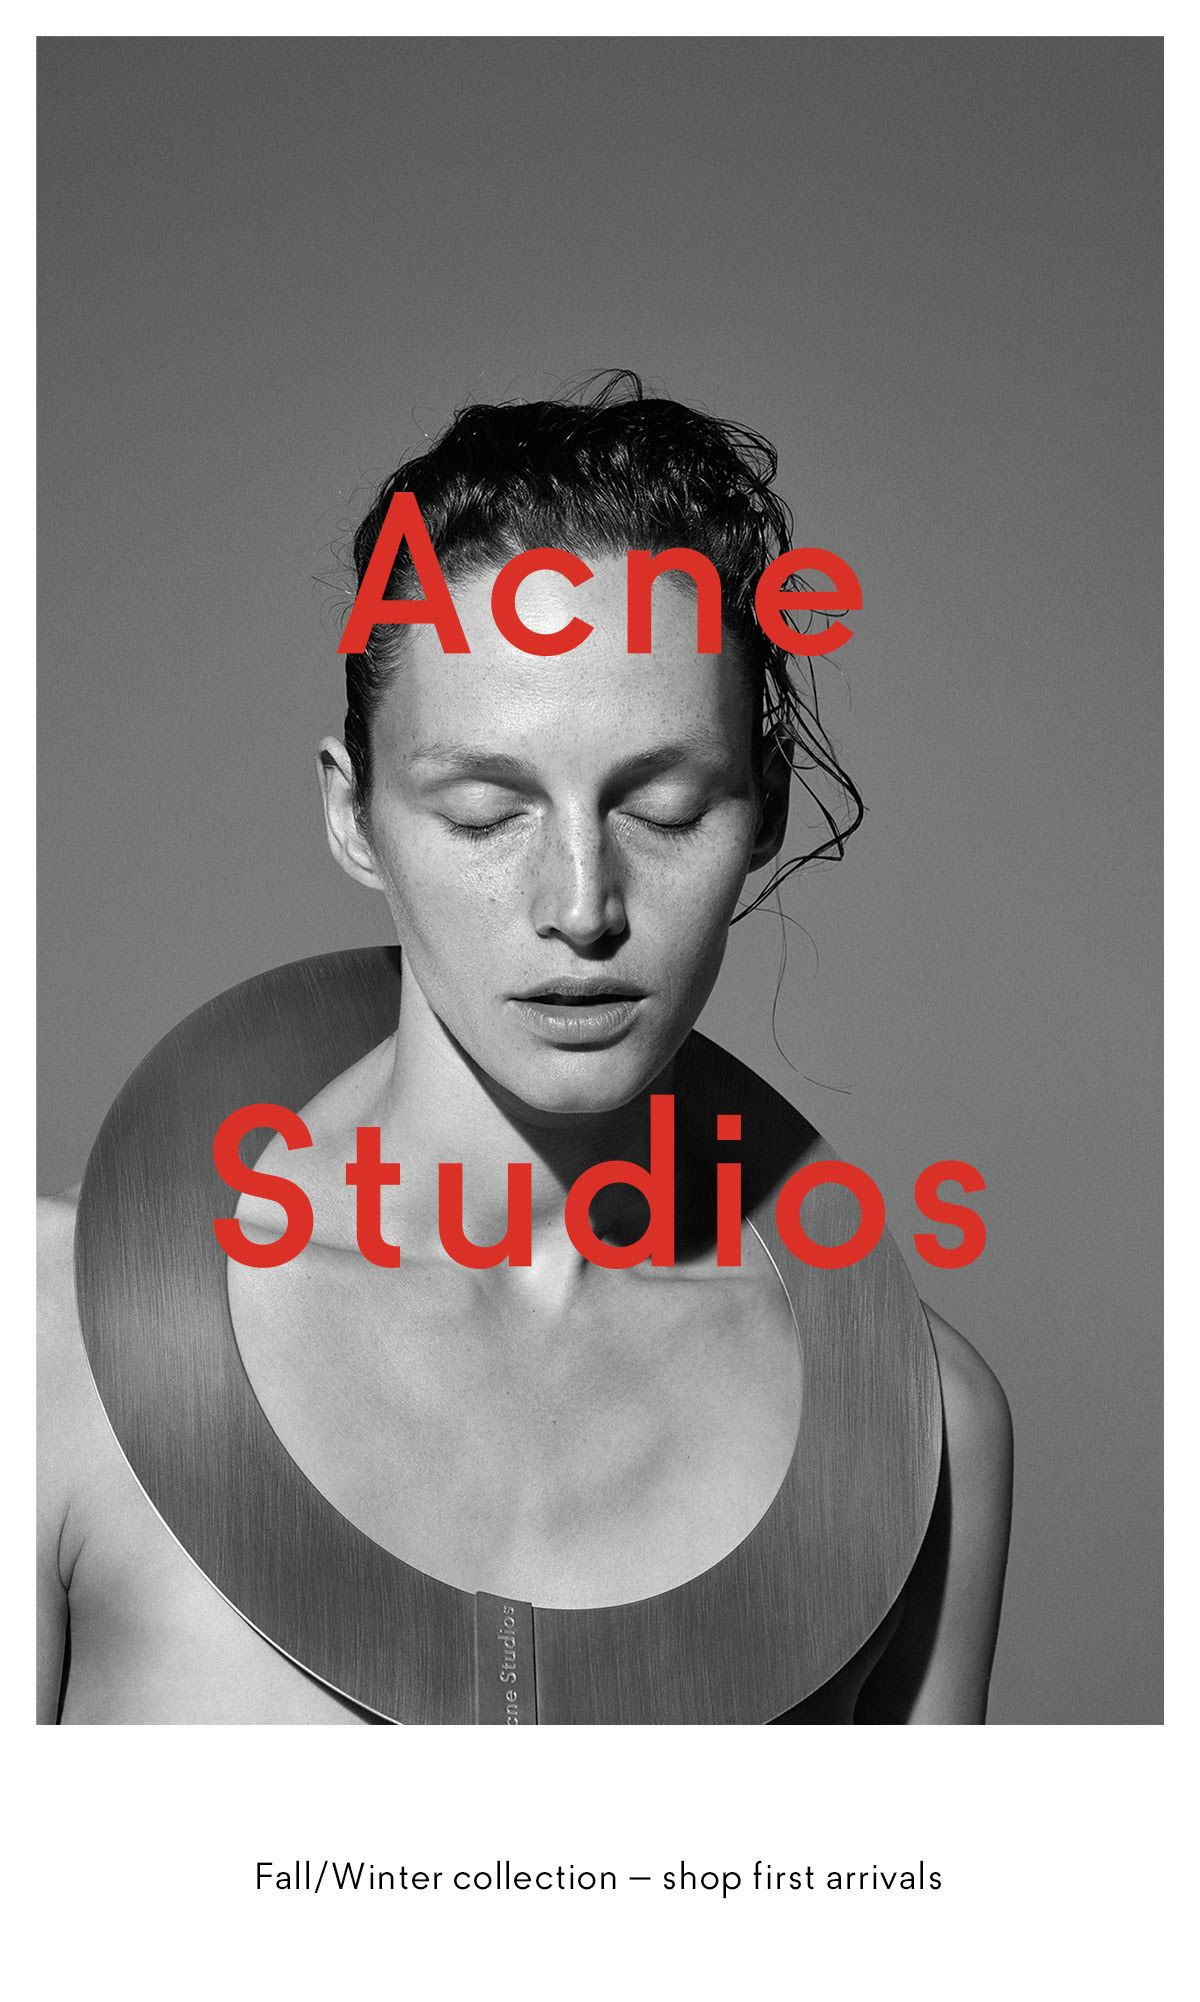 acne advertising ab